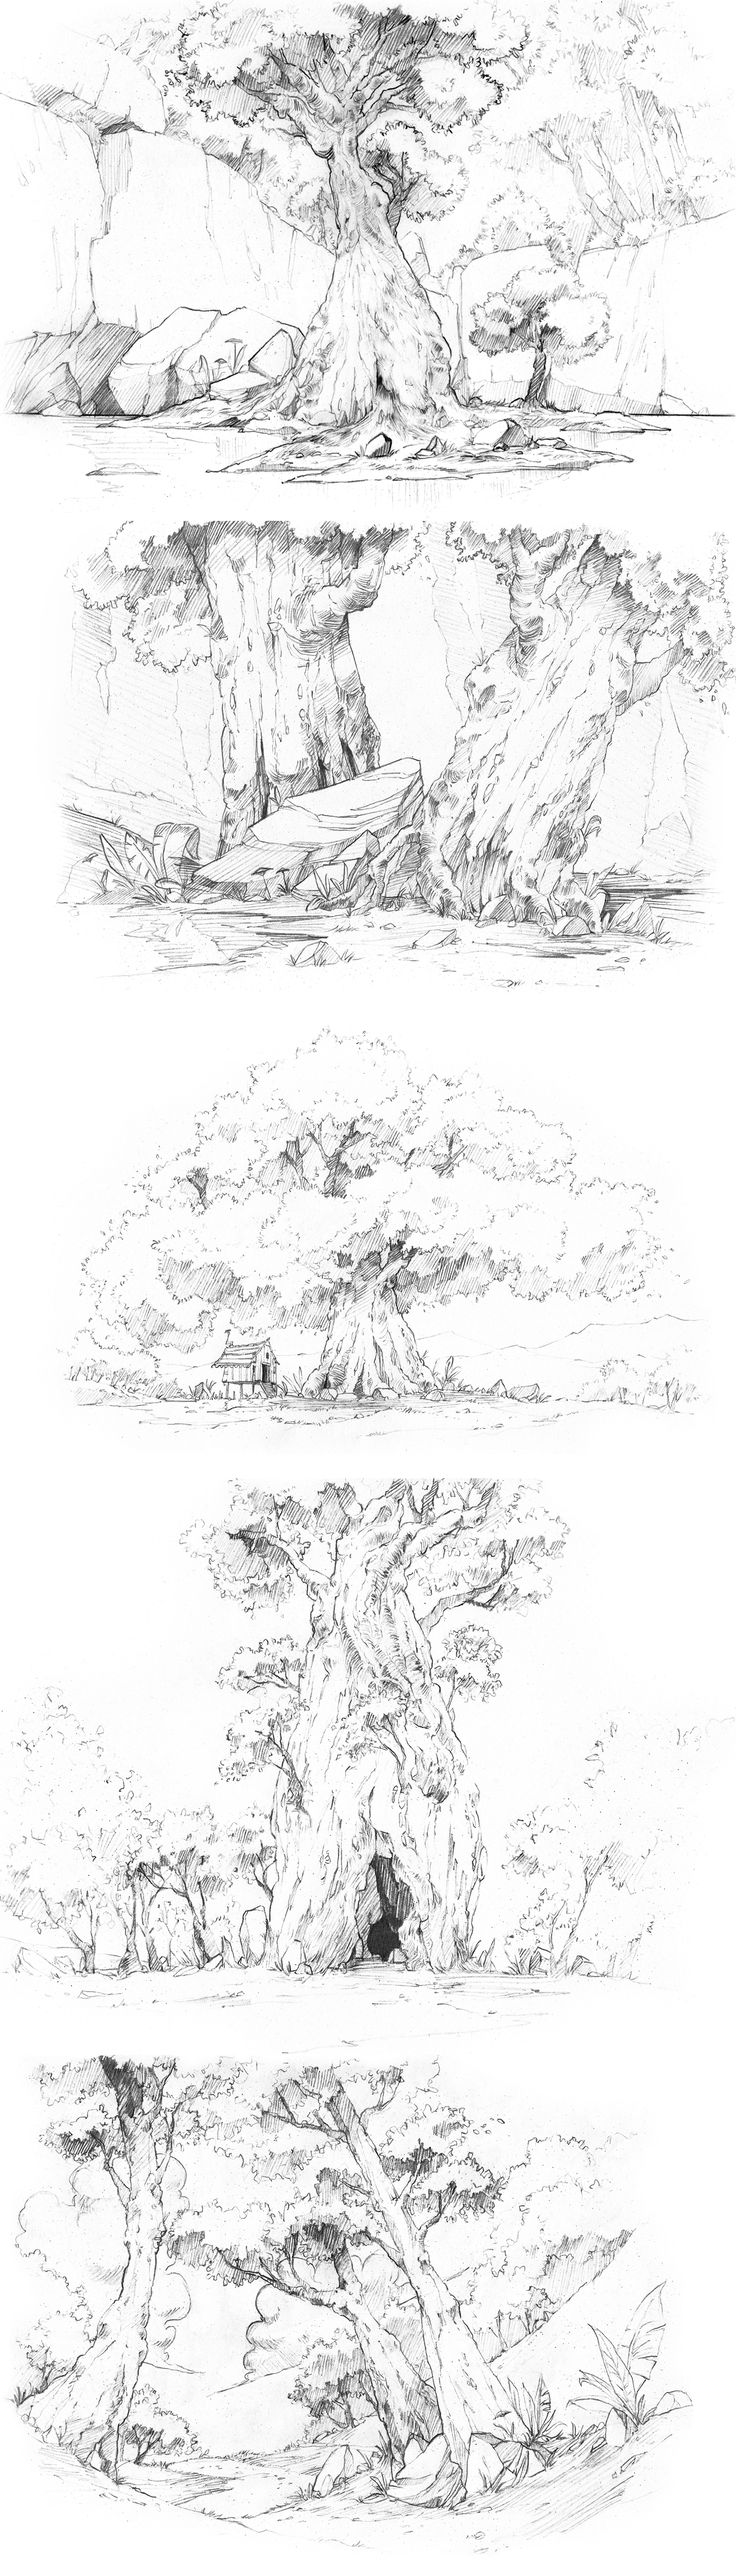 Client: Personal workRole: Concept art, illustration, landscape design, background